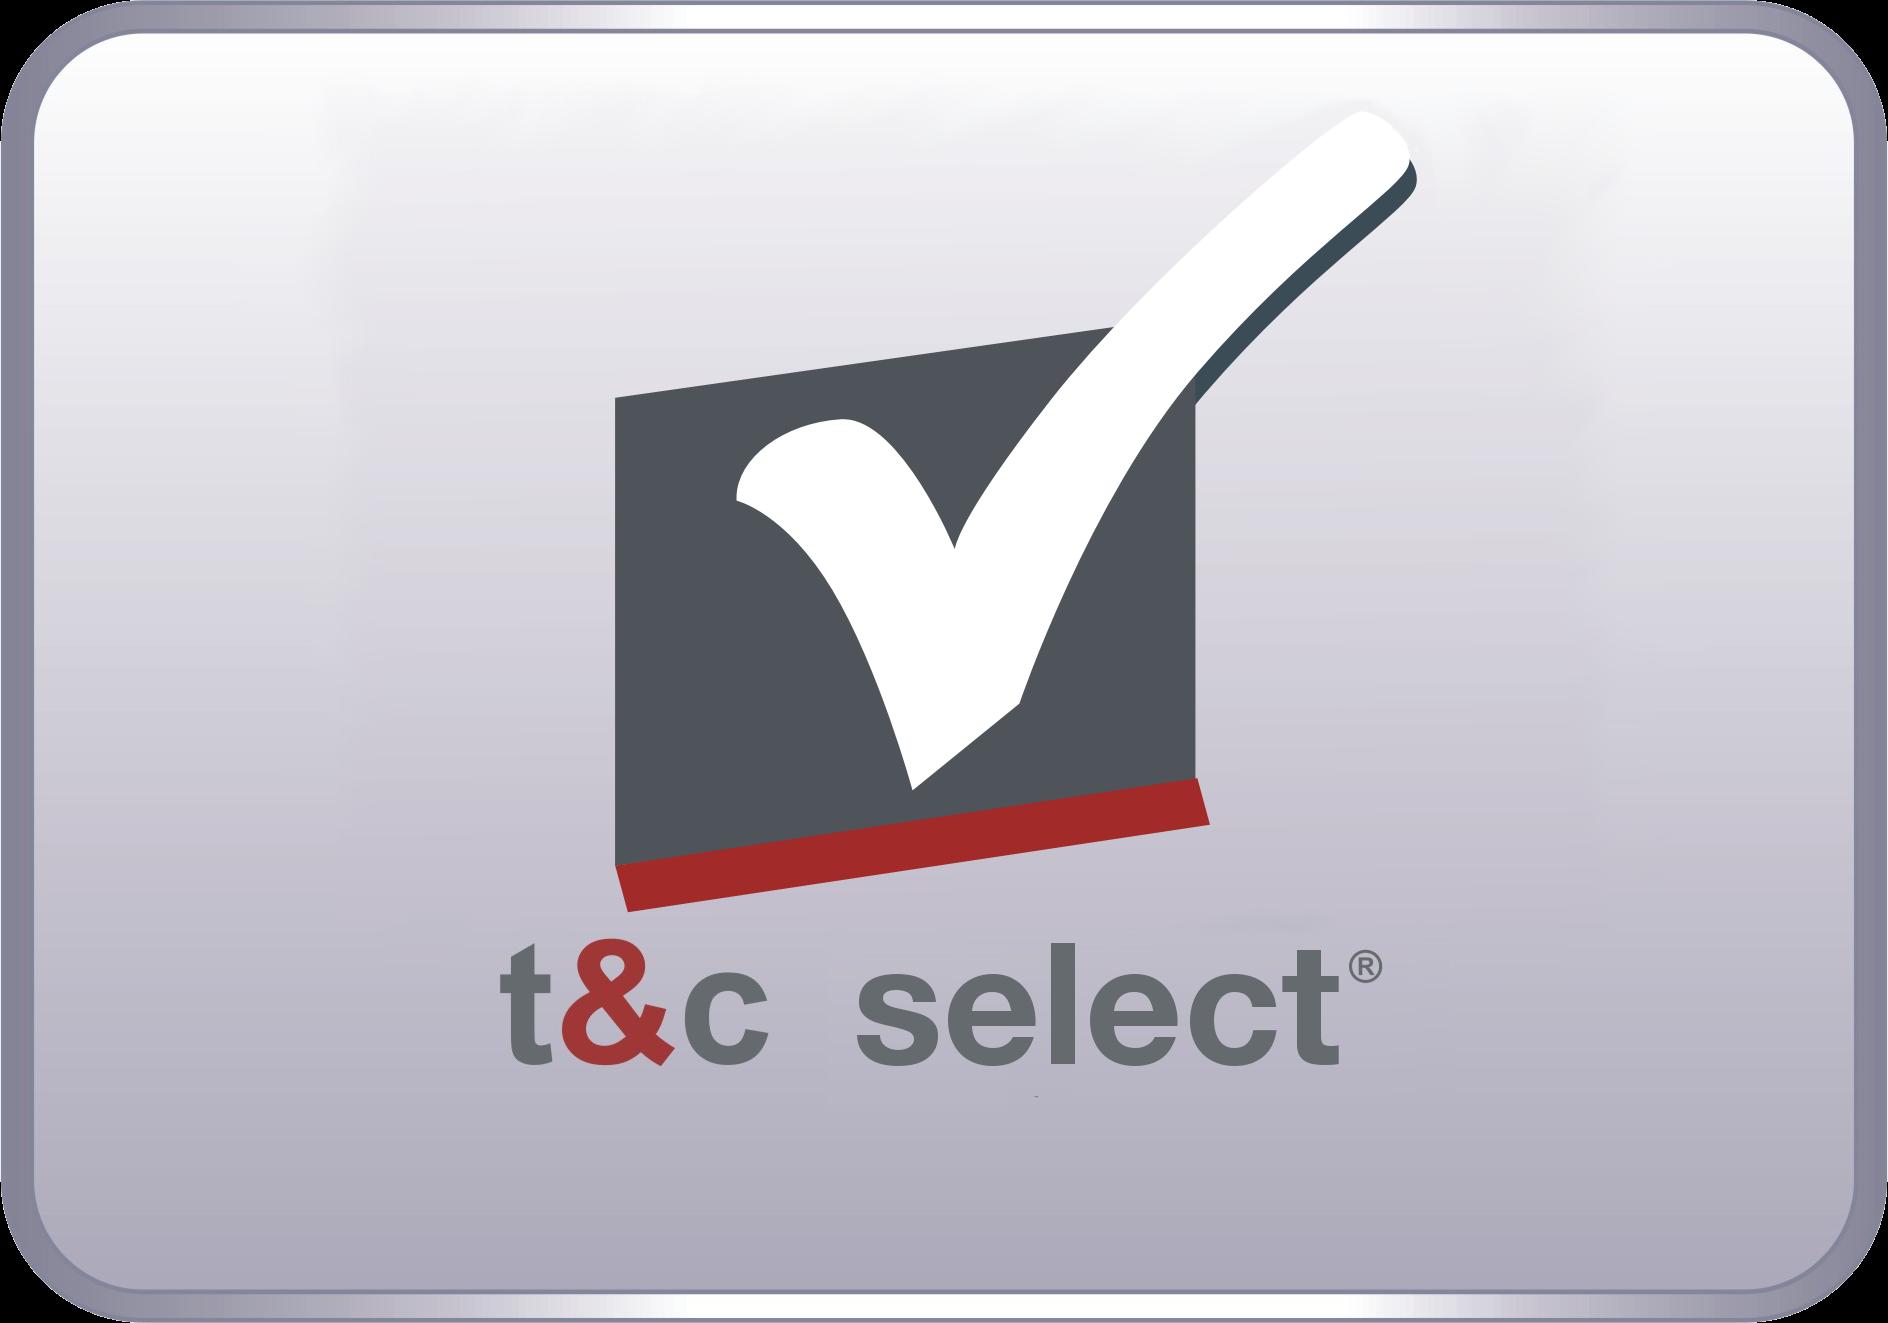 t&c_select